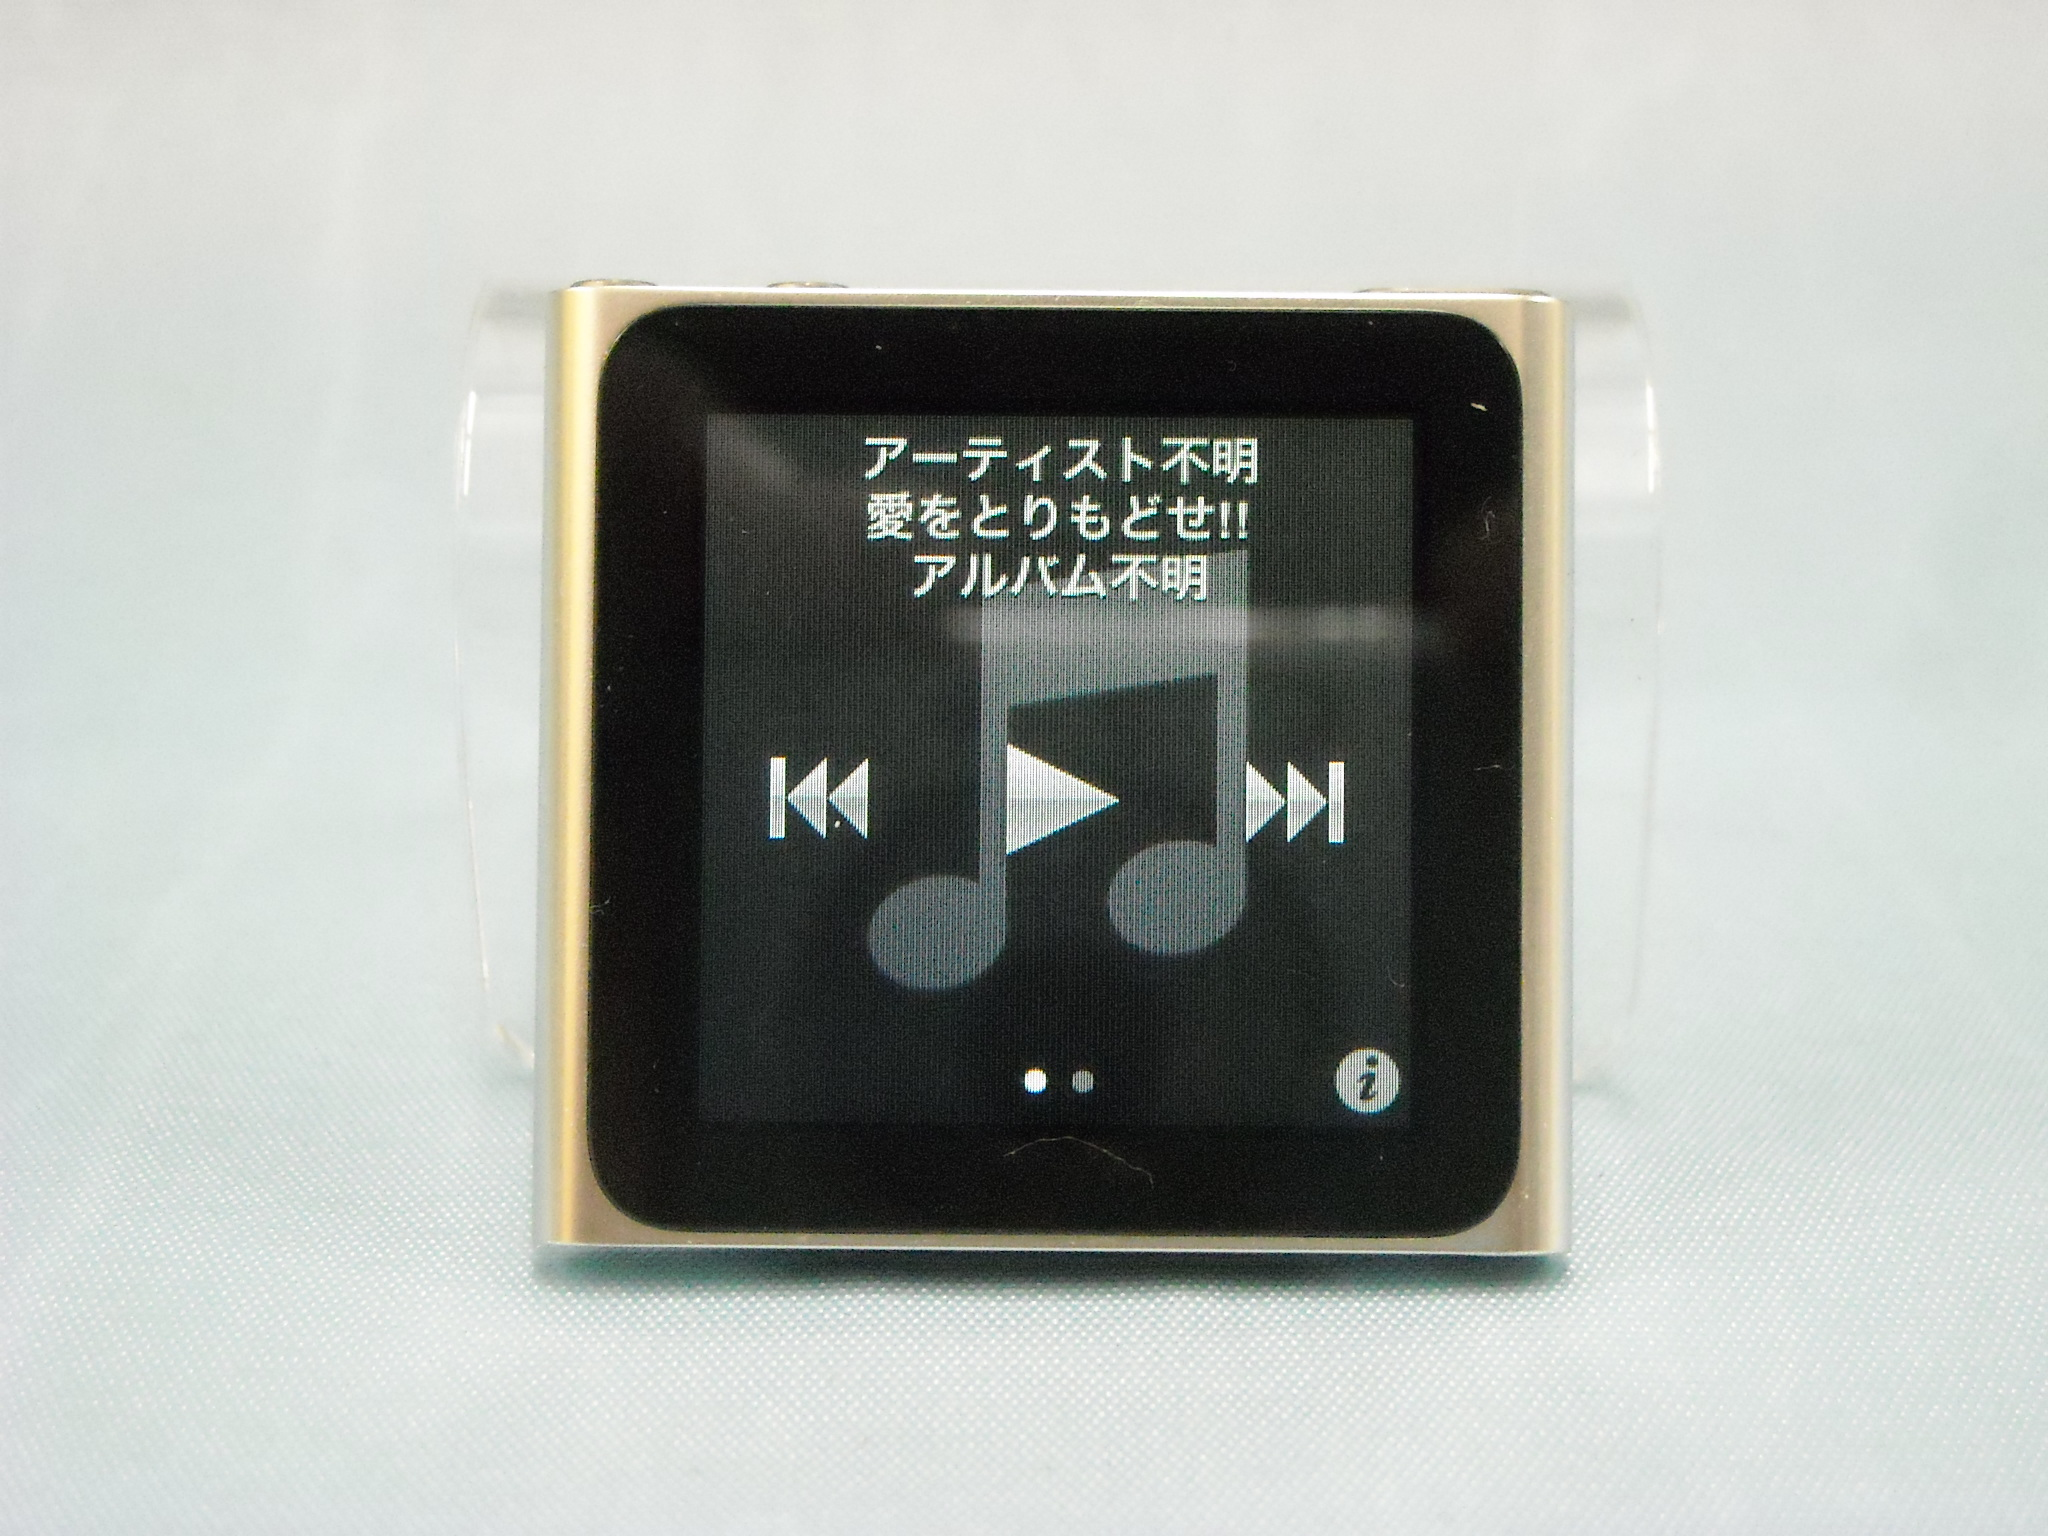 Apple iPod nano買取|名古屋リサイクルショップ ハードオフ西尾